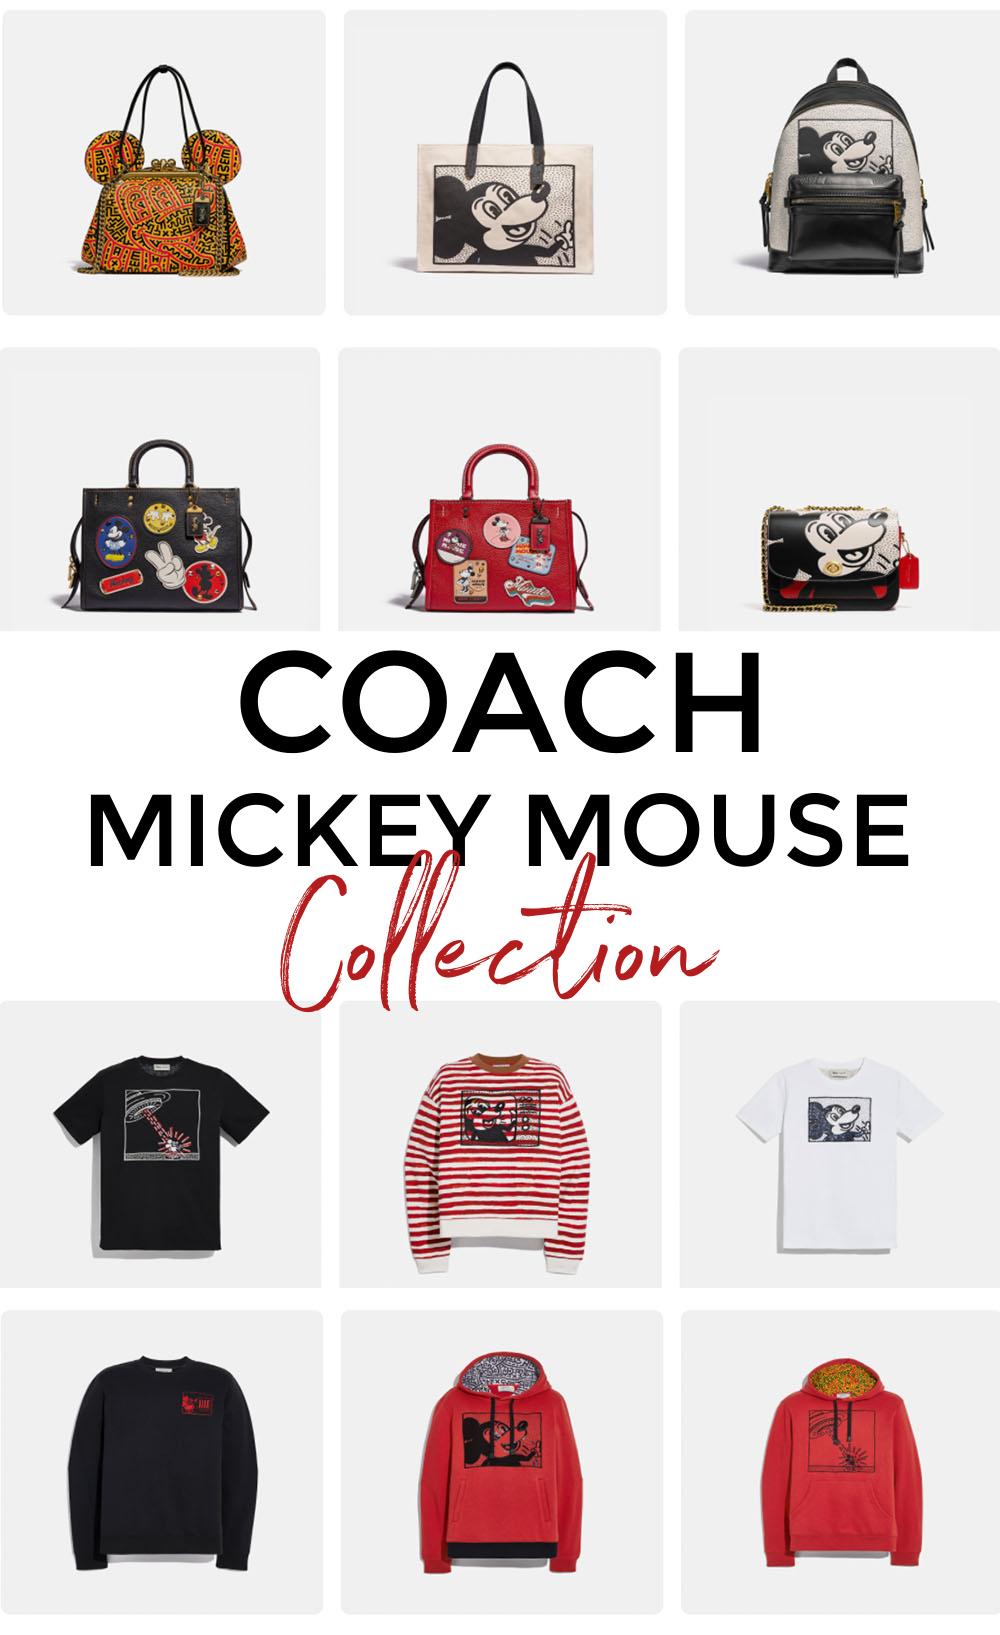 COACH Mickey Mouse Collection on Kaia Gerber I DreaminLace.com #COACH #fashionblog